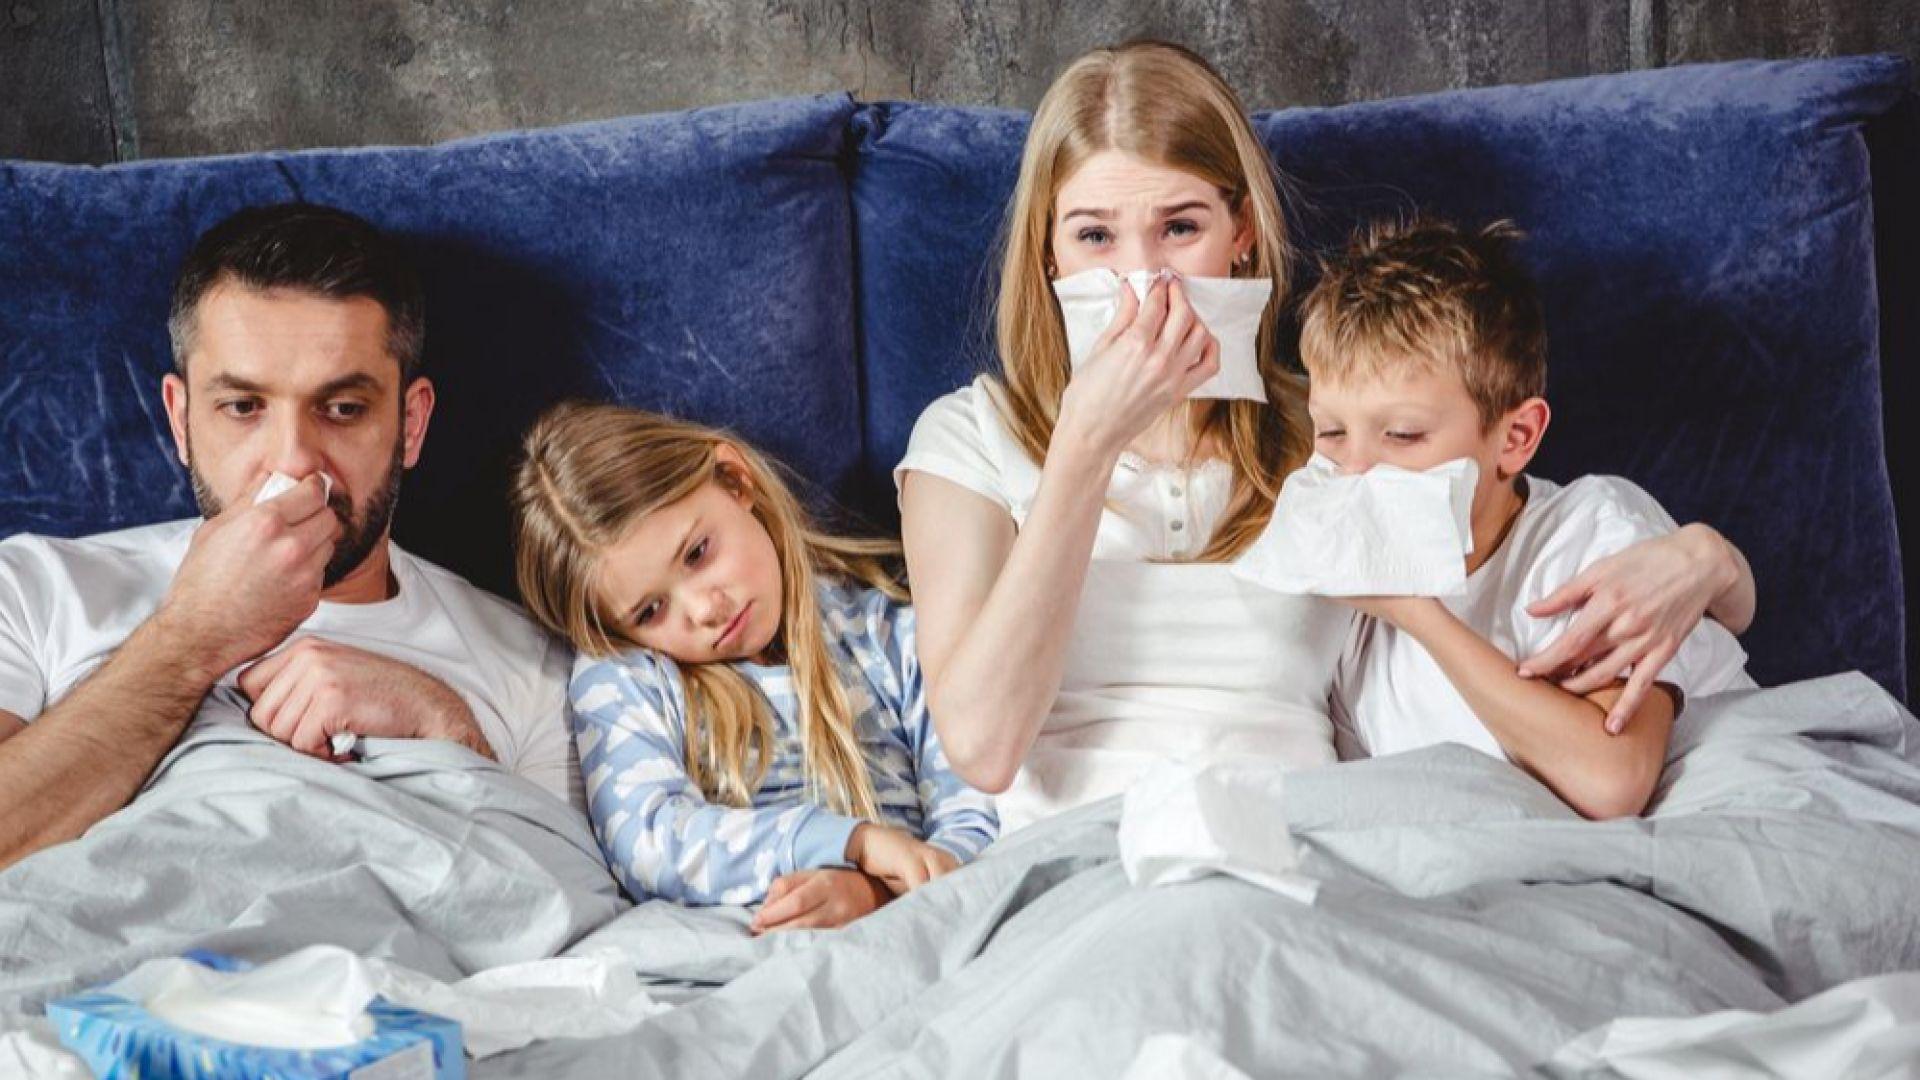 Специалистите припомнят: При настинка си правете гаргара